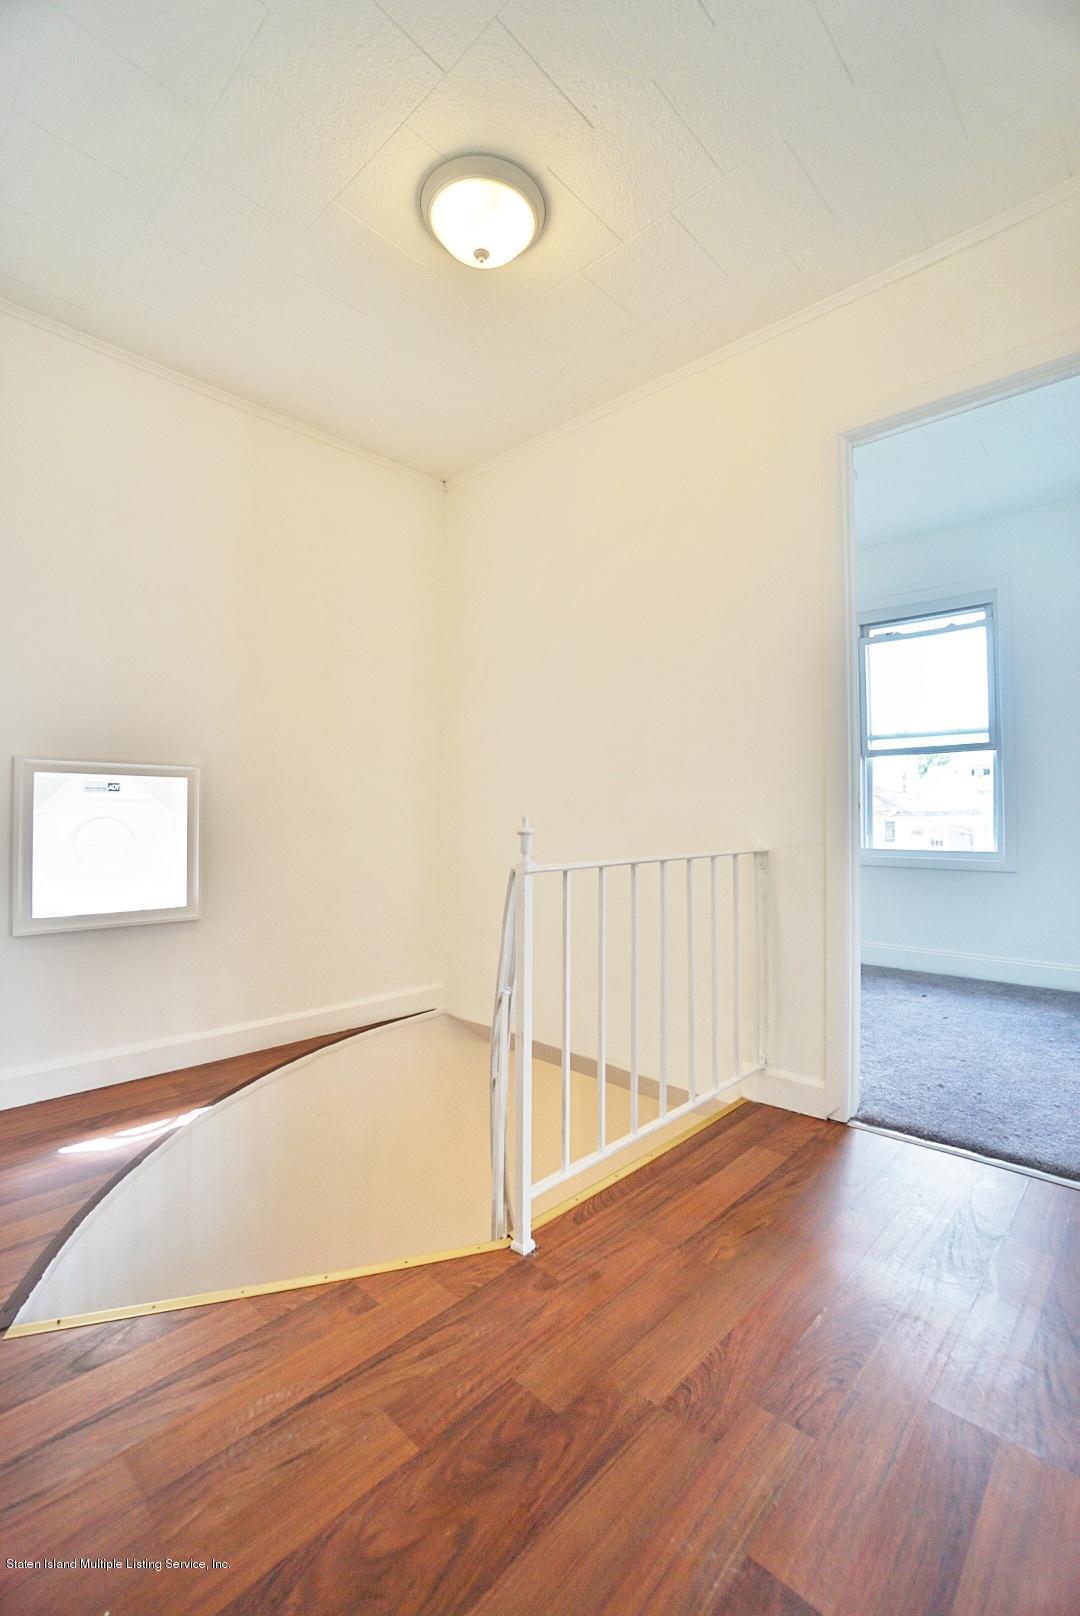 Single Family - Detached 53 Dubois Avenue  Staten Island, NY 10310, MLS-1128749-29